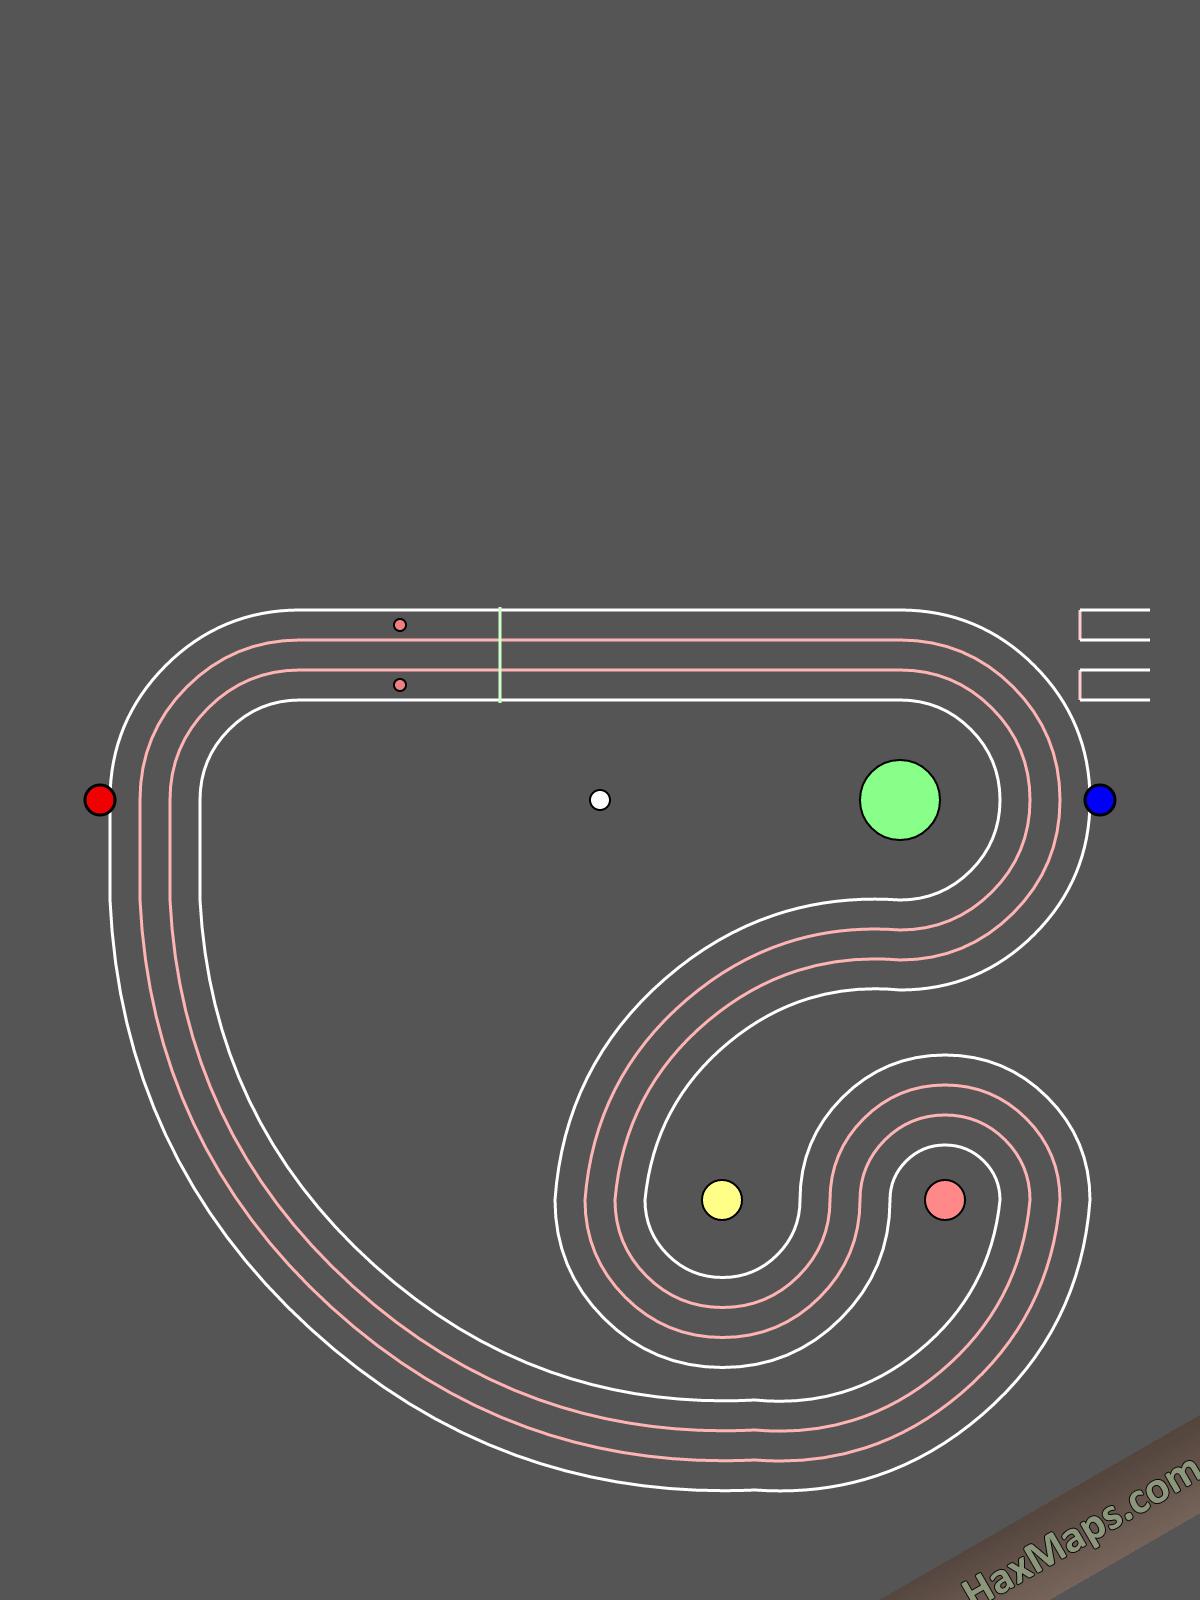 hax ball maps   пеаольпынгыоо